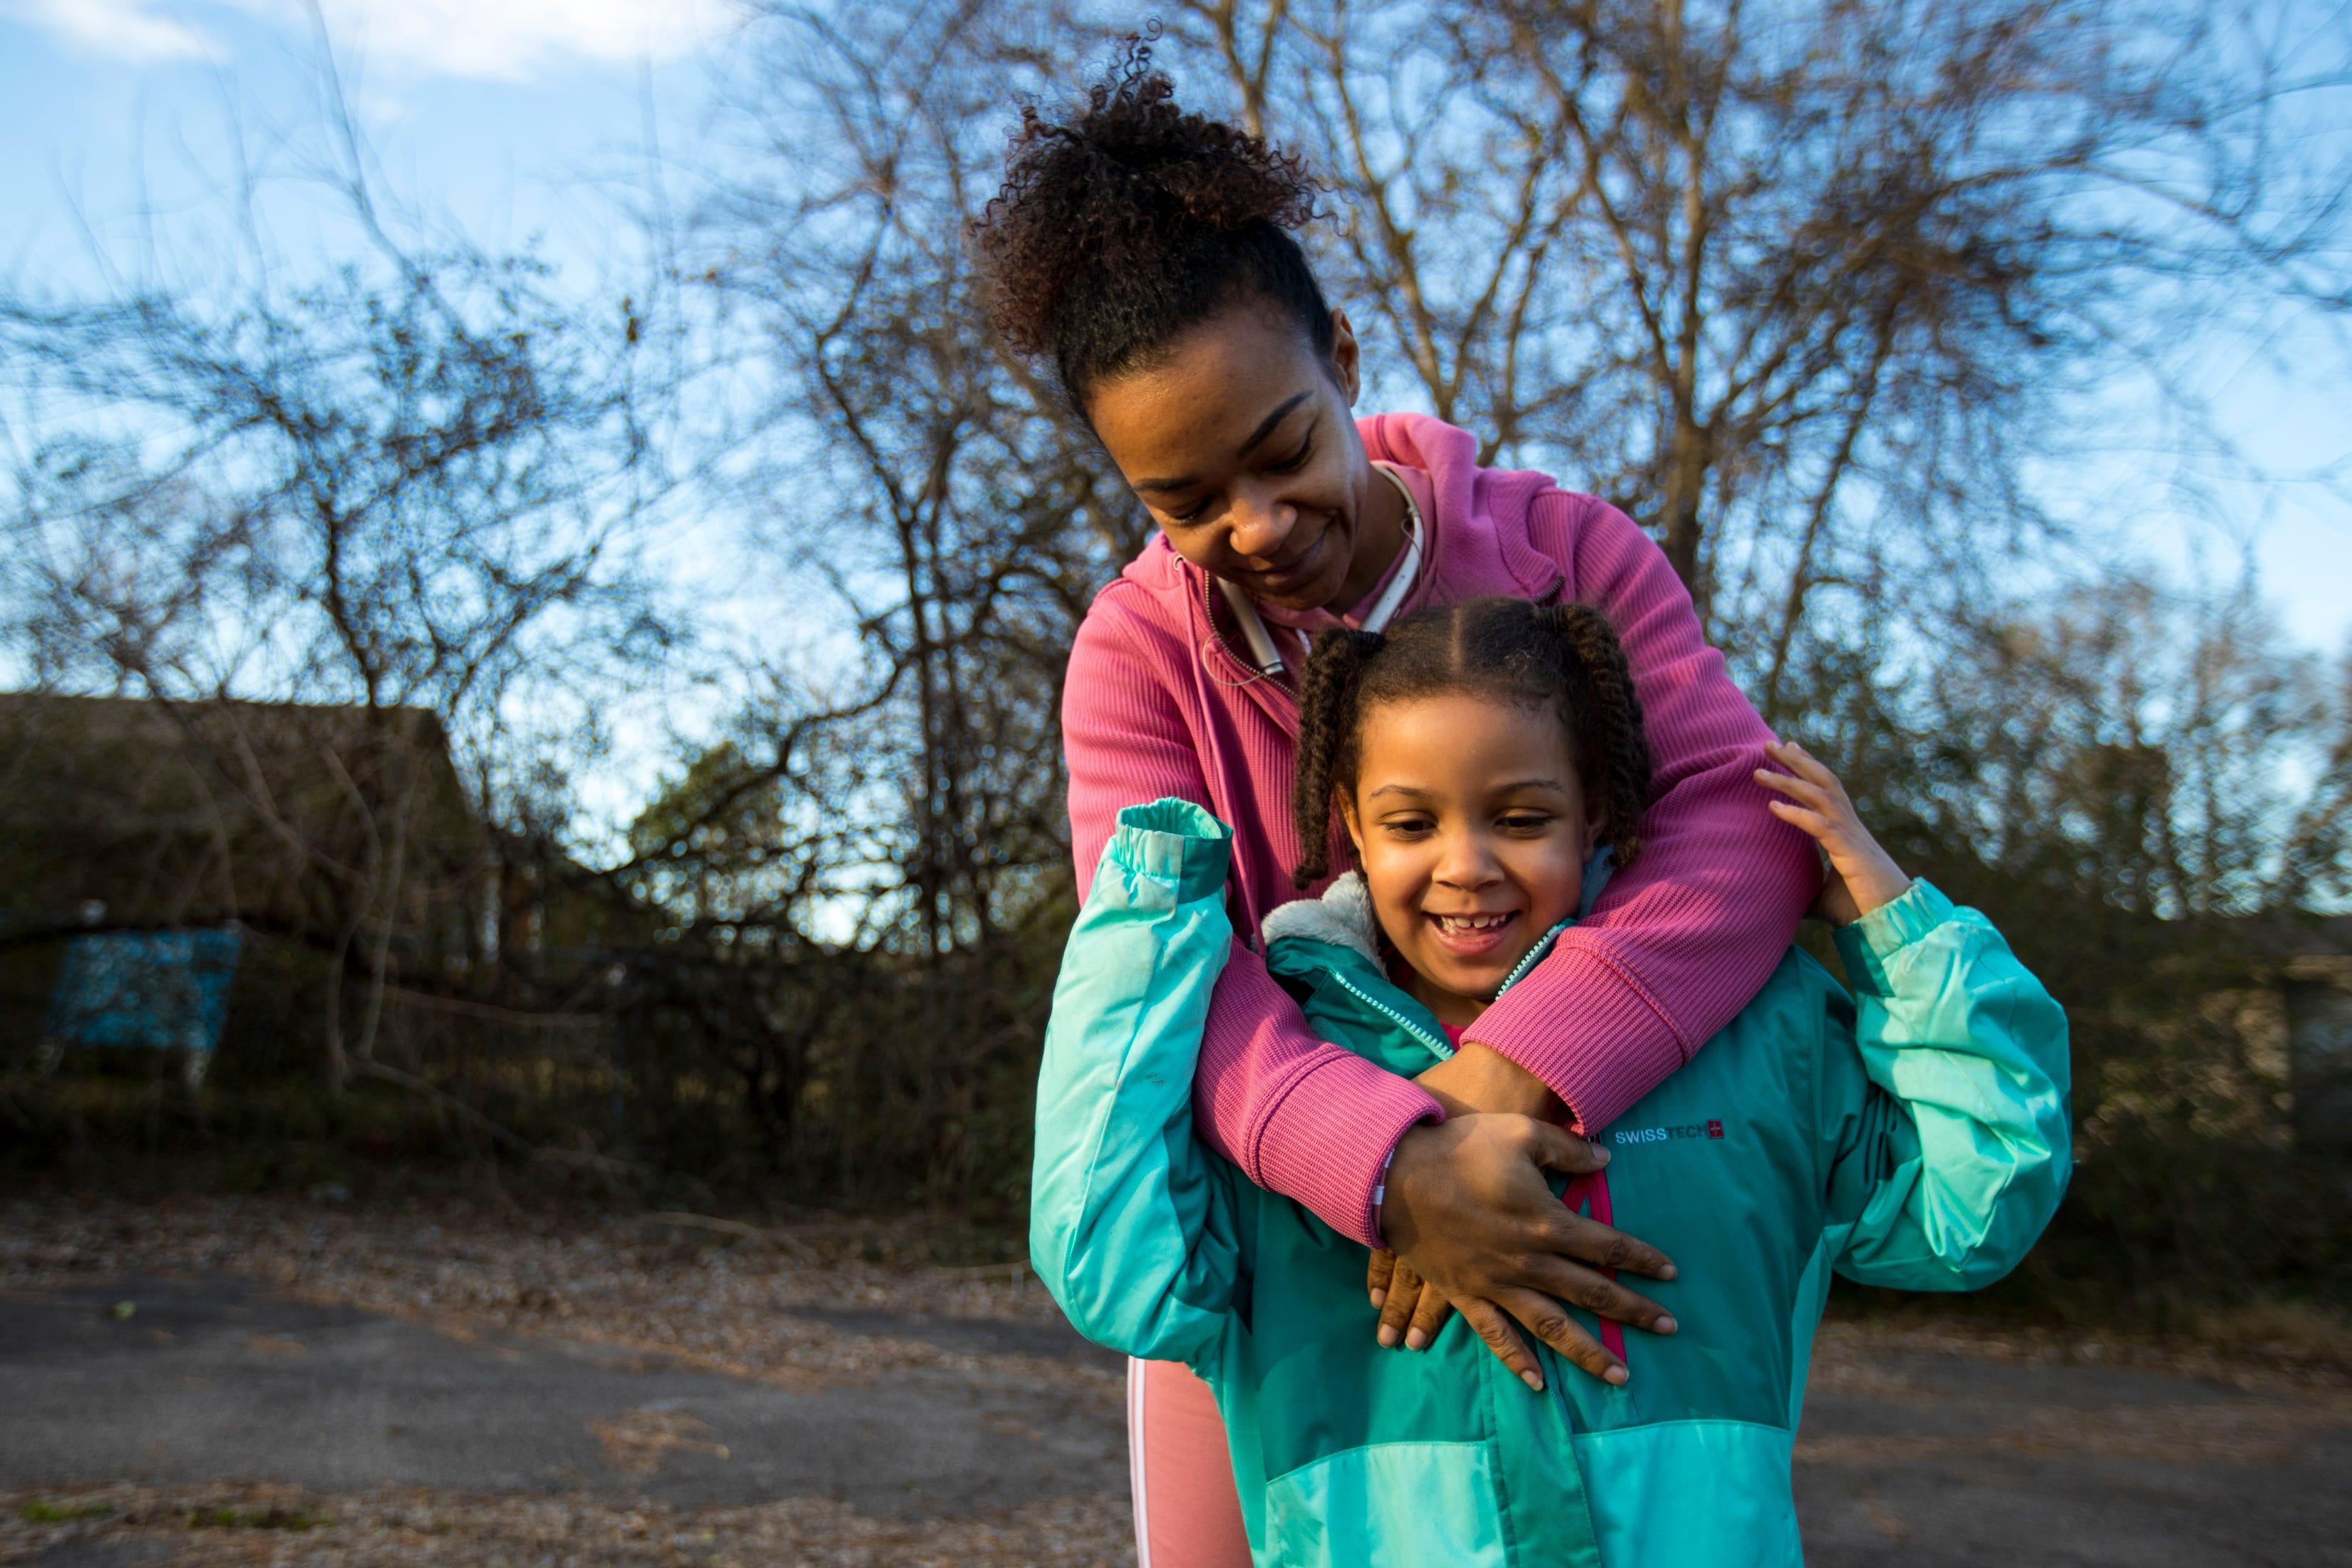 tennessean.com - Kristen Davis, The Tennessean - Break cycles of childhood trauma to address chronic social ills | Opinion